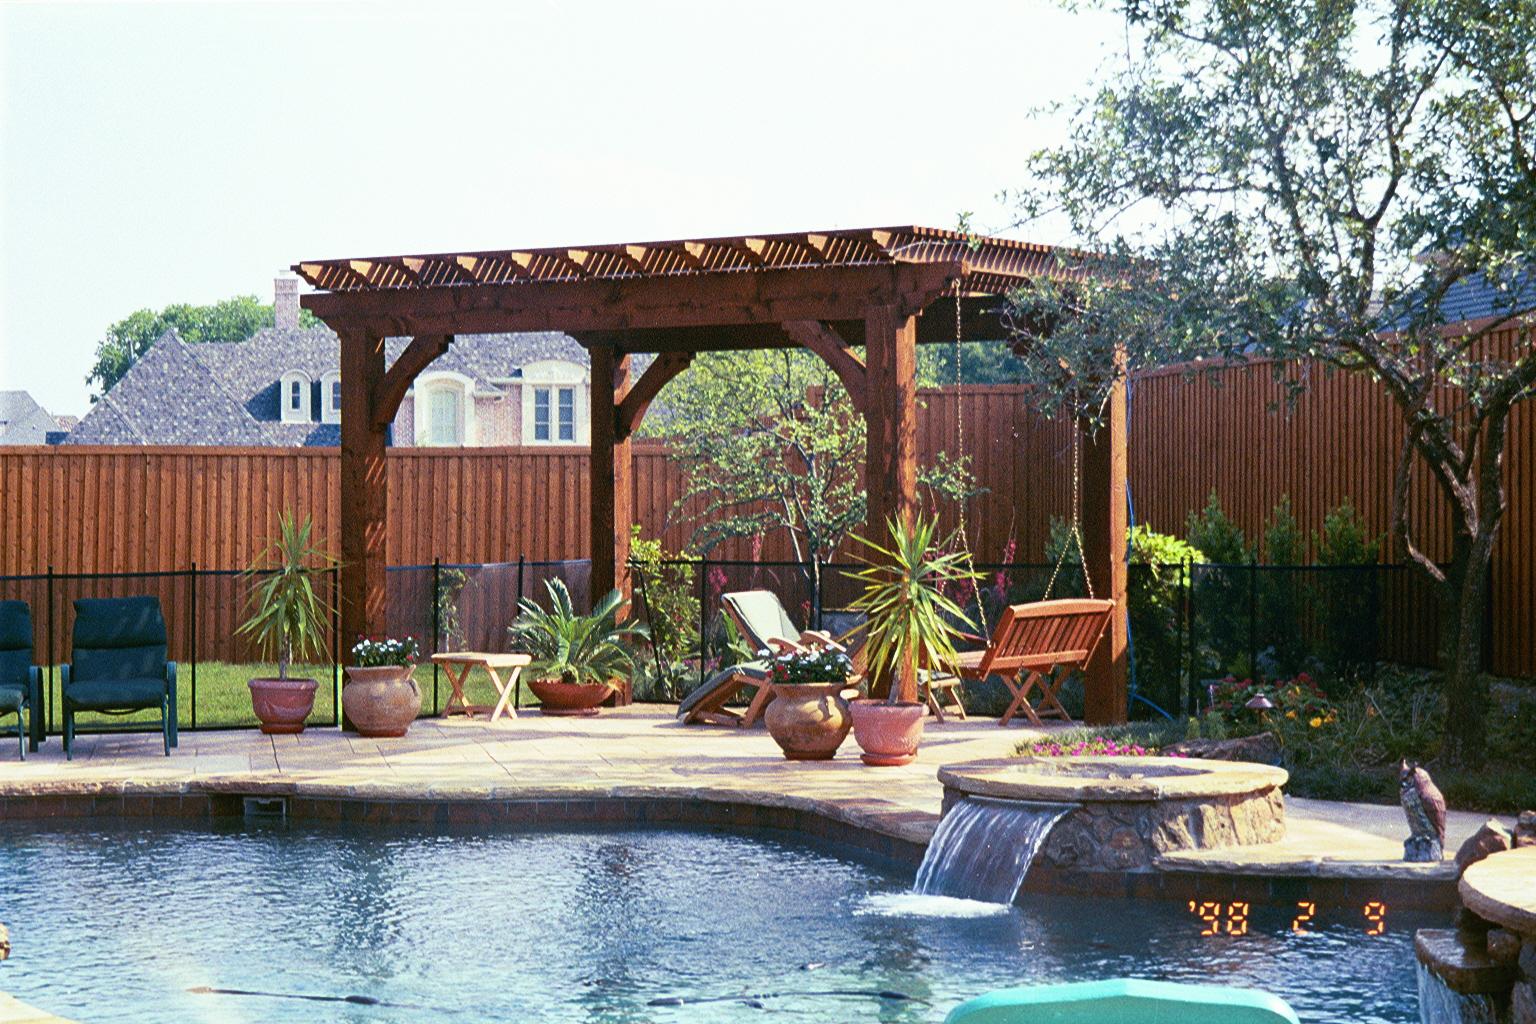 Pergolas & Gazebos - Primo Outdoor Living on Primo Outdoor Living  id=67941